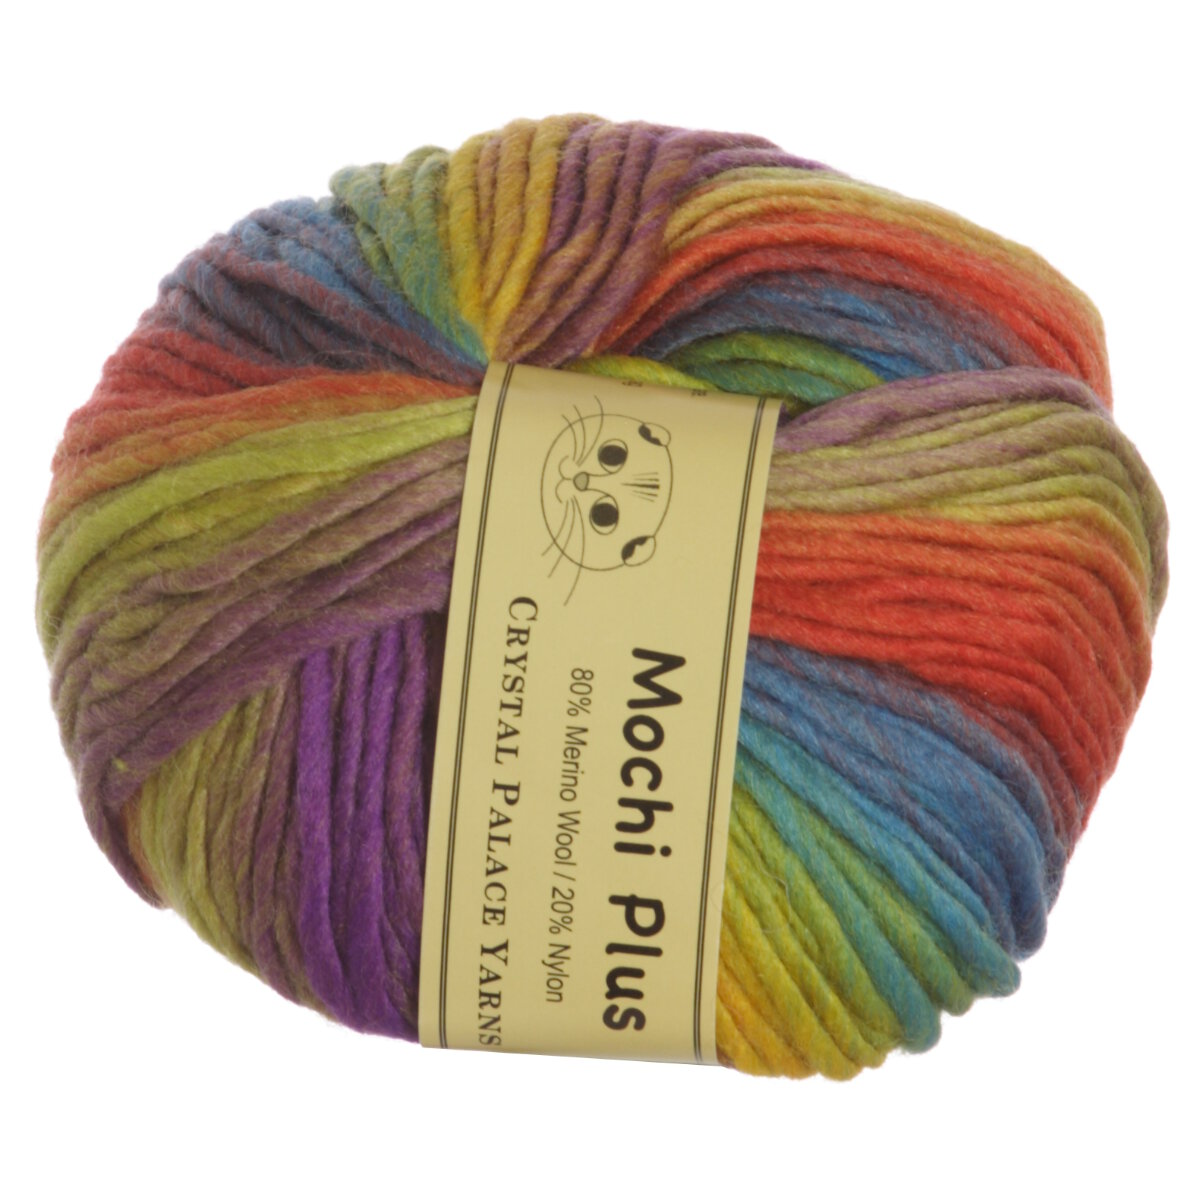 image 1 image 2 sorry but we no longer carry the product crystal palace mochi plus yarn